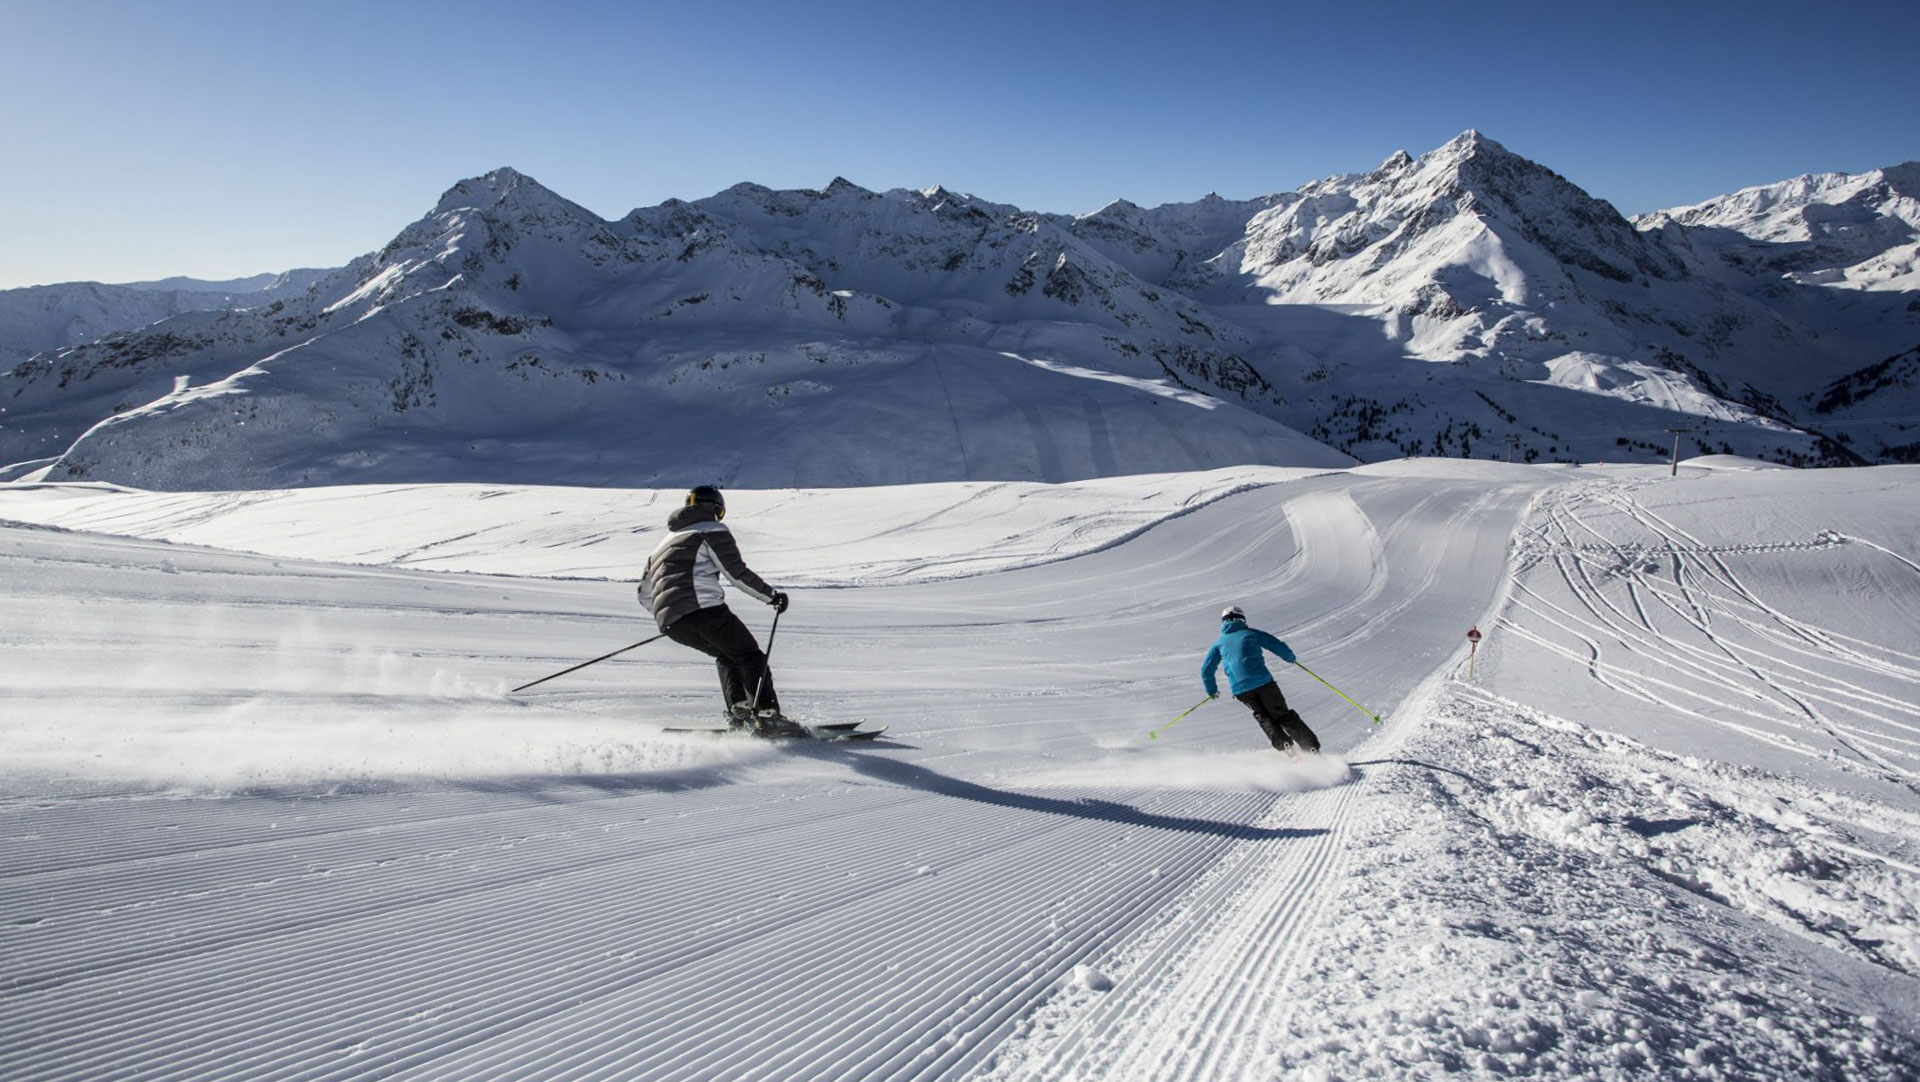 Two skiers carve down freshly groomed corduroy pistes in Kuthai ski area